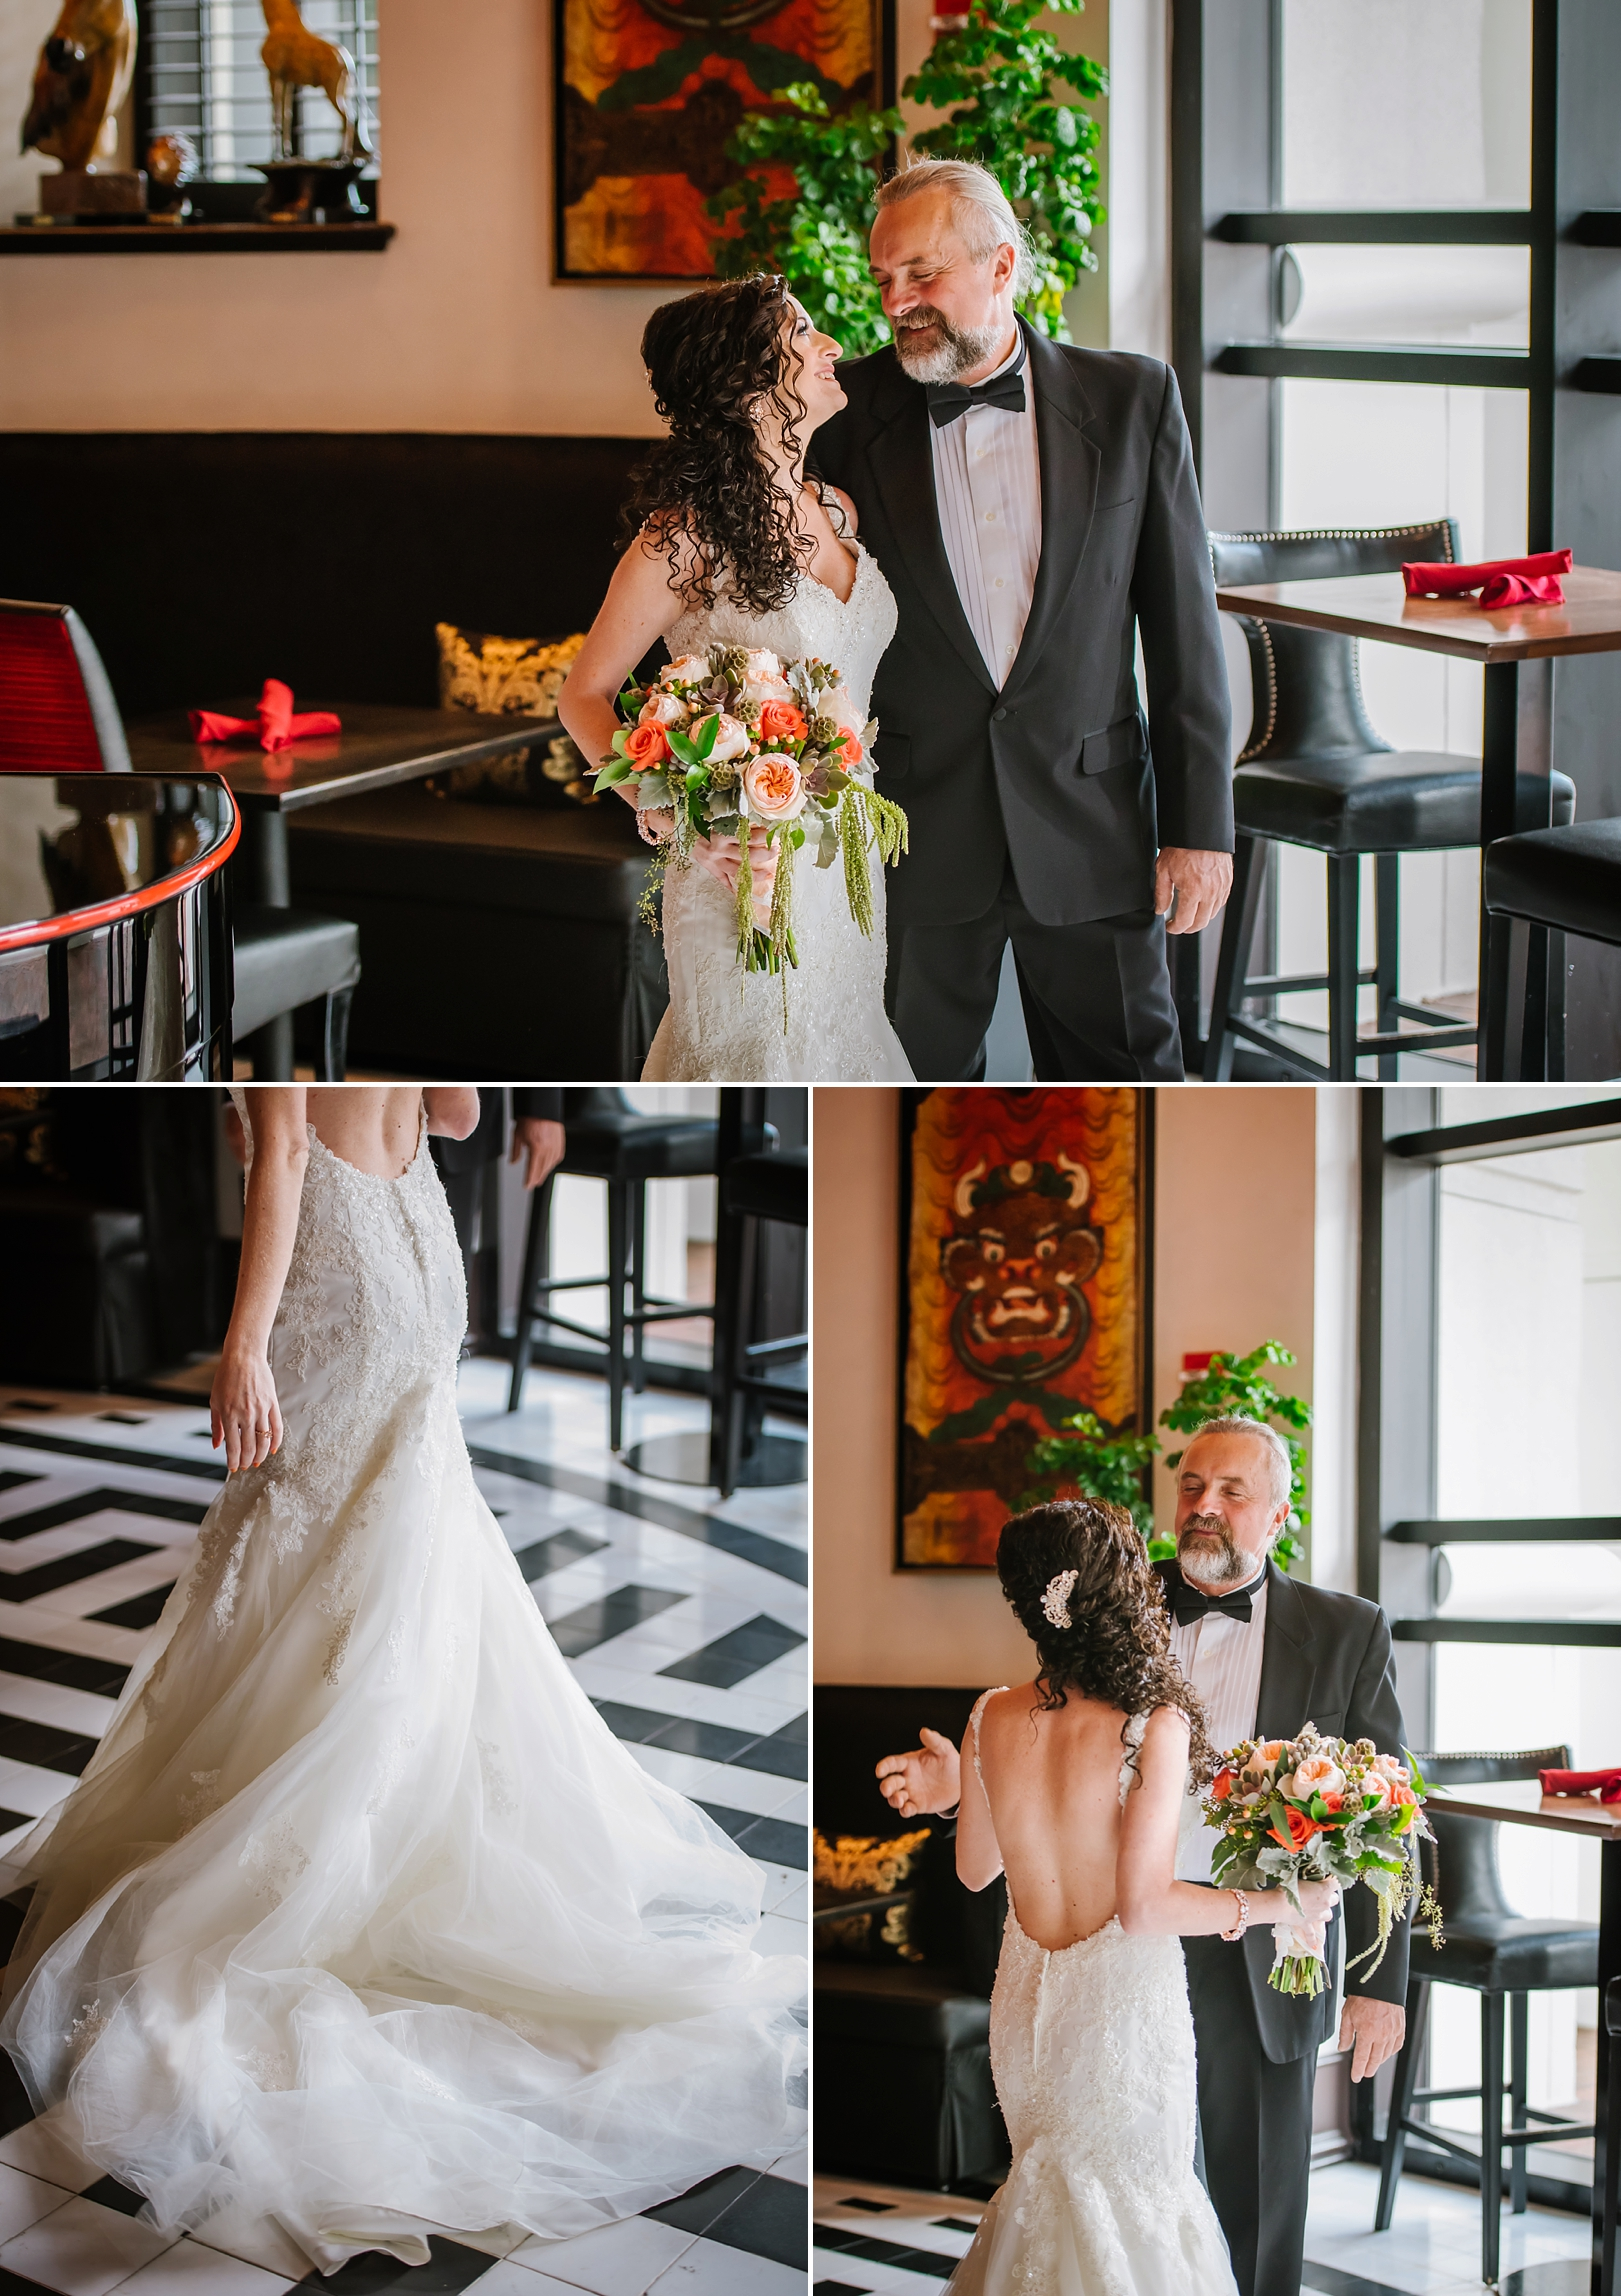 kraft-azalea-gardens-stylish-elopment-wedding-photography_0008.jpg